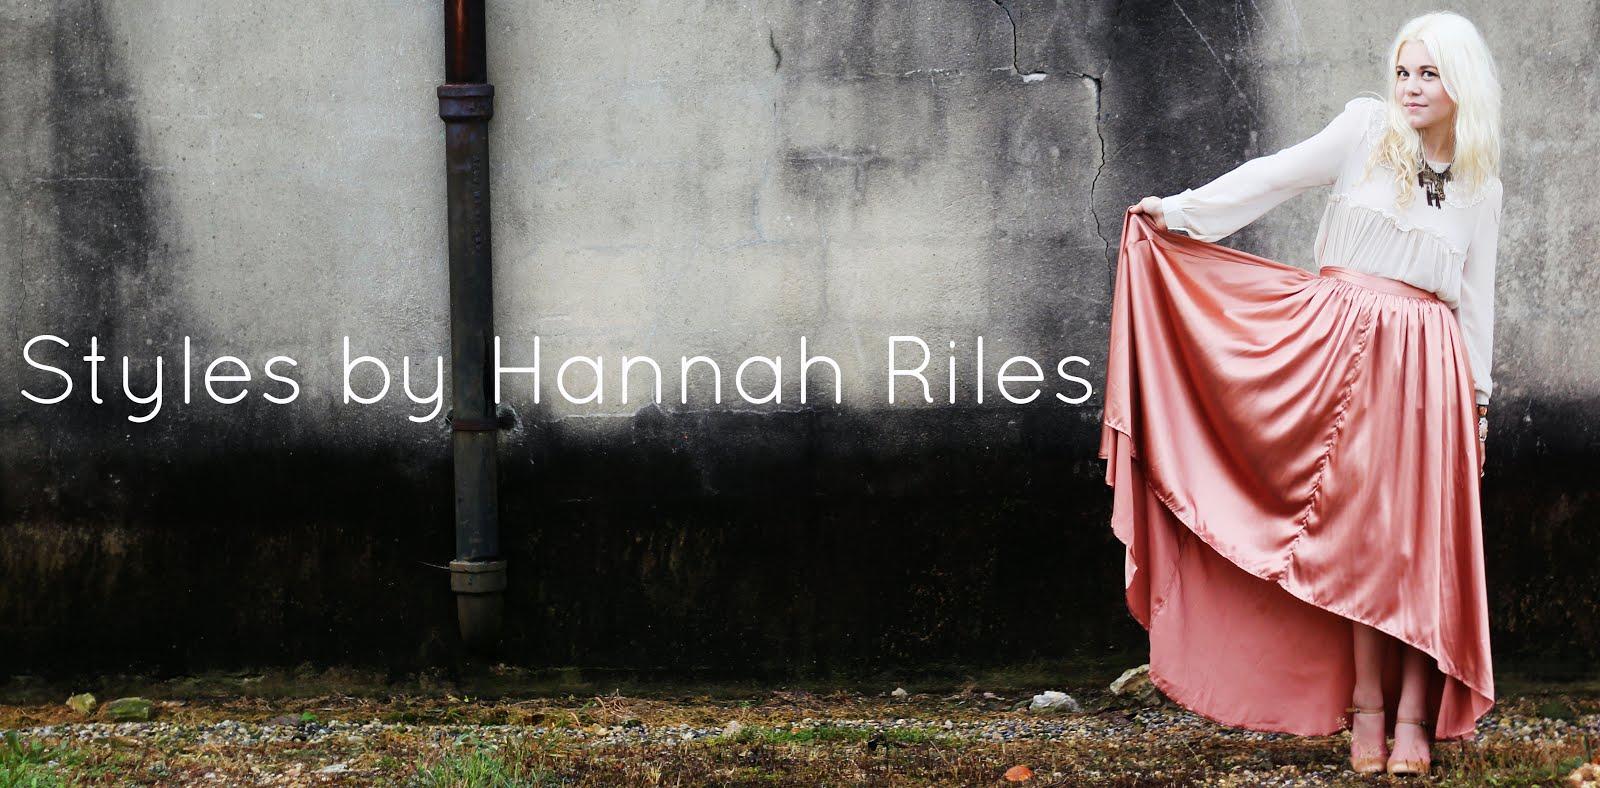 Styles by Hannah Riles